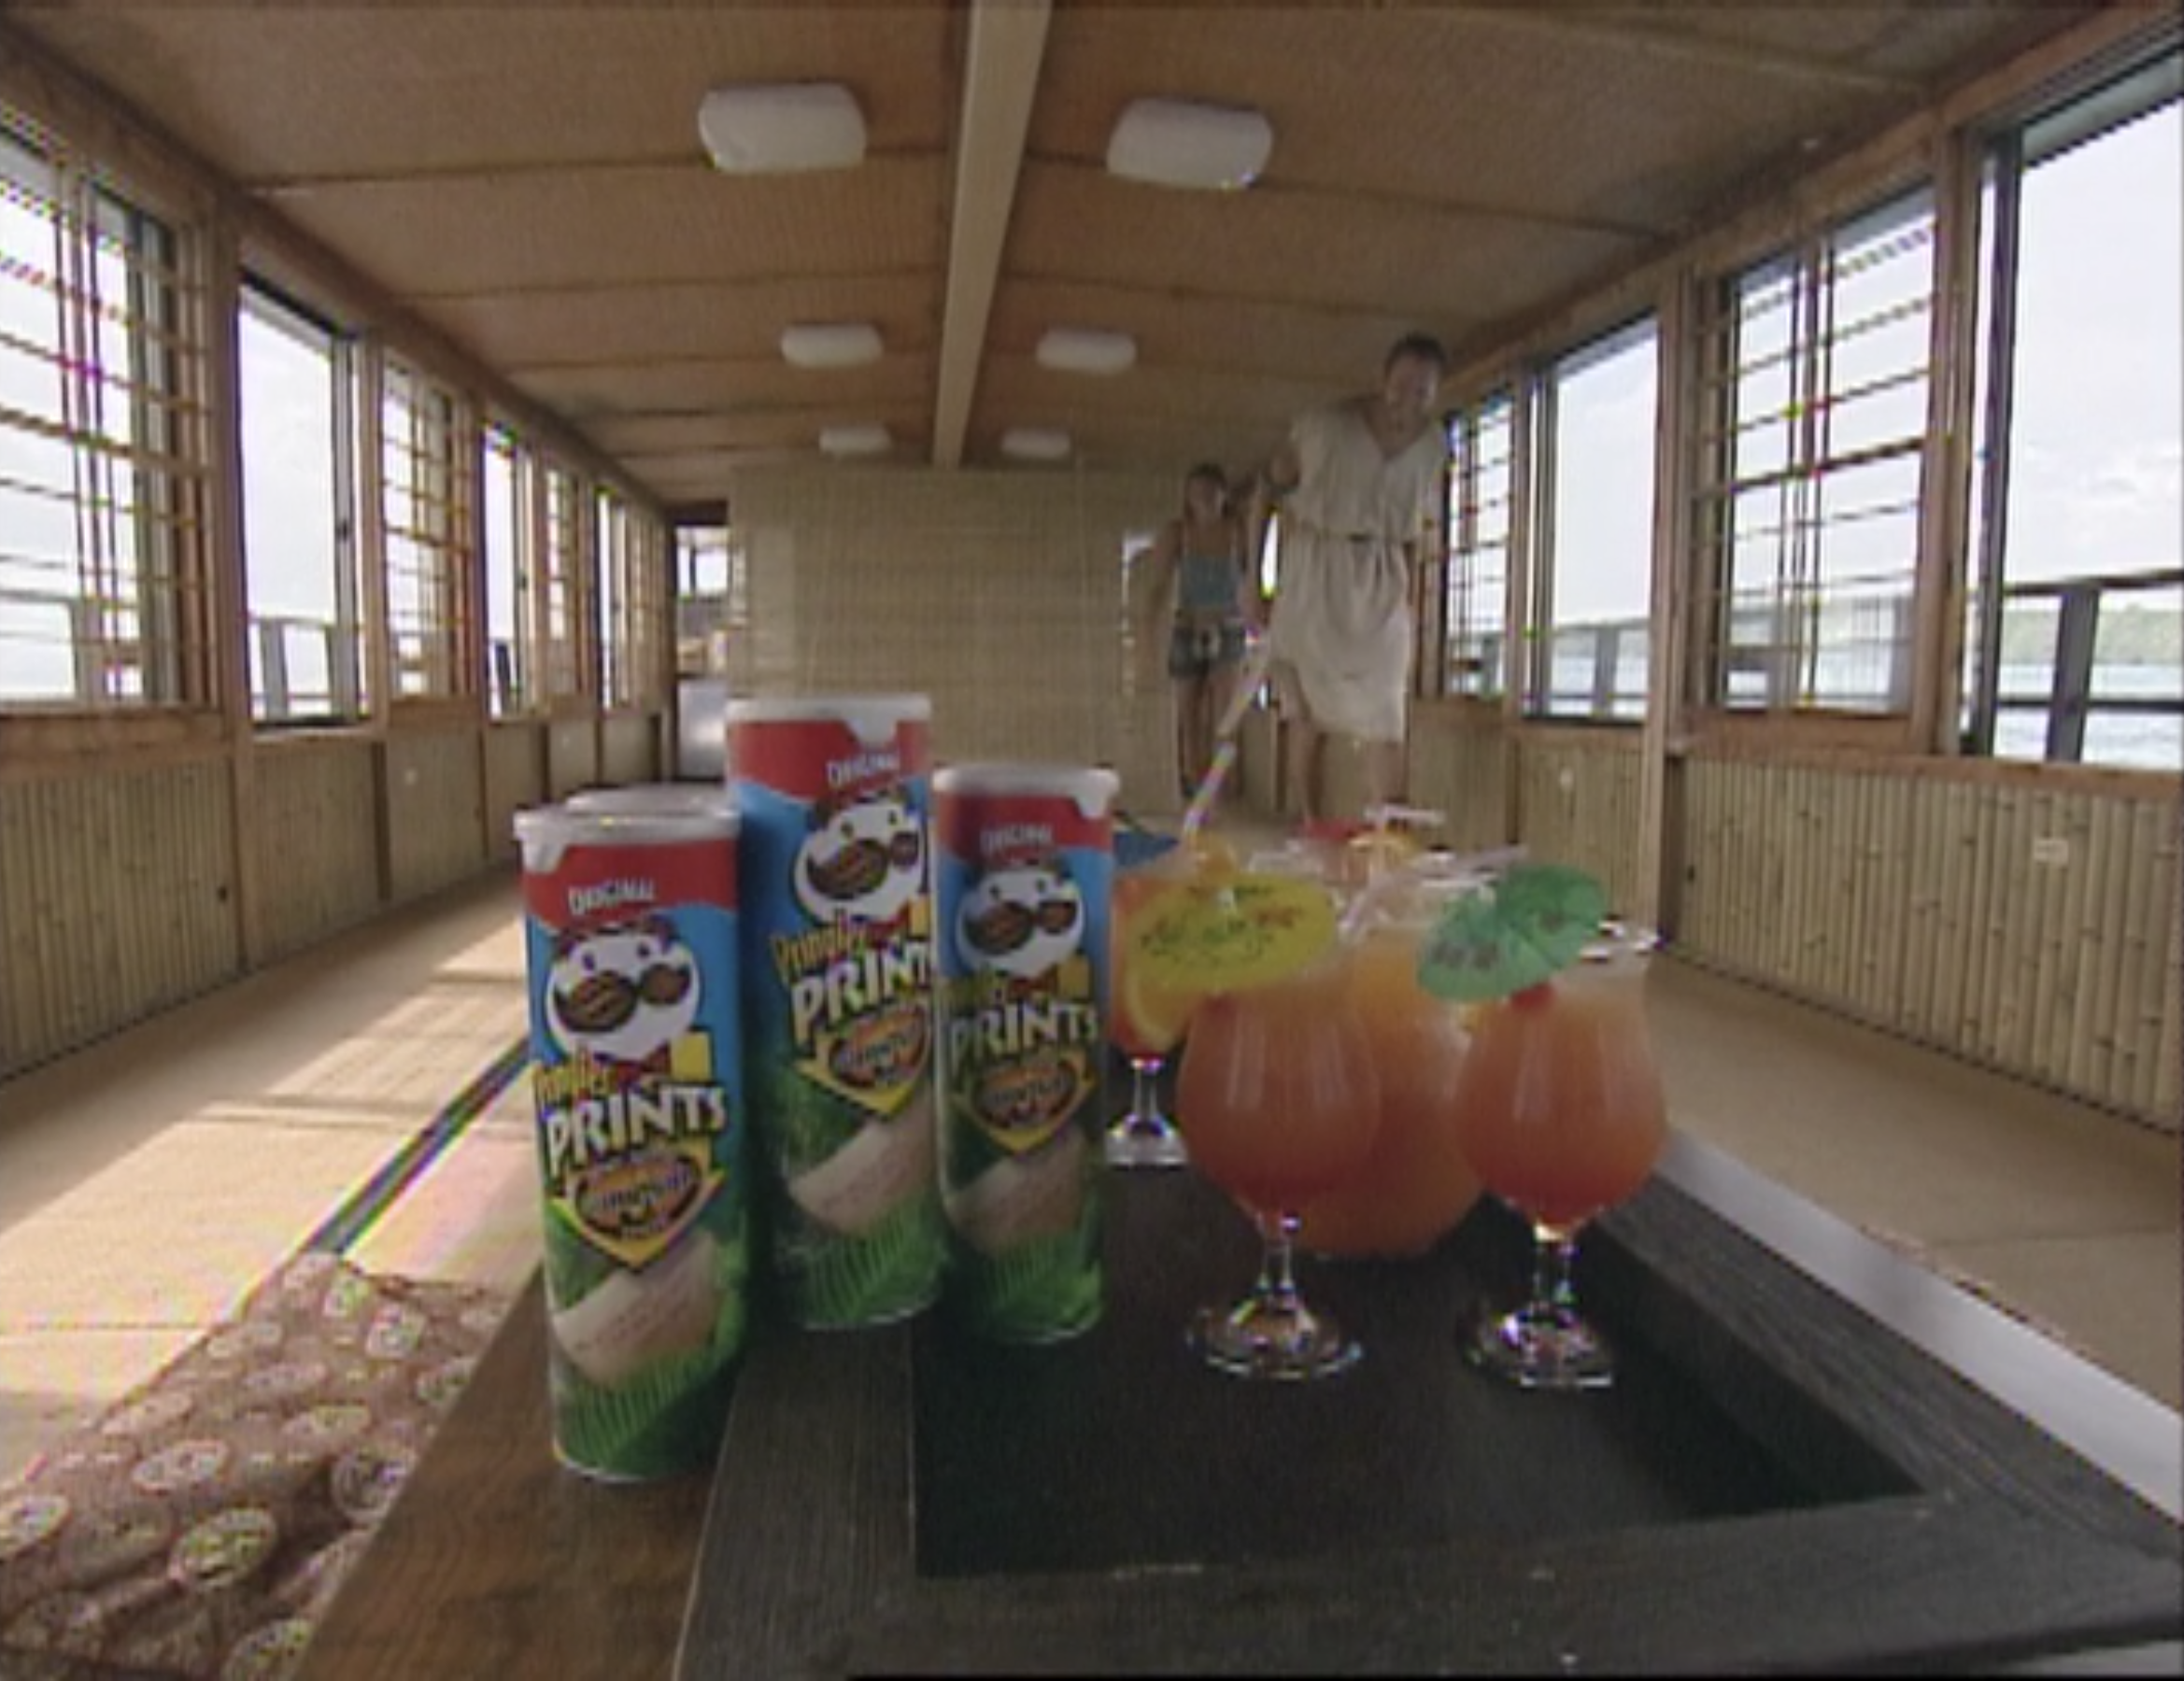 Several cans of Survivor Trivia Pringles next to Mai-Tais